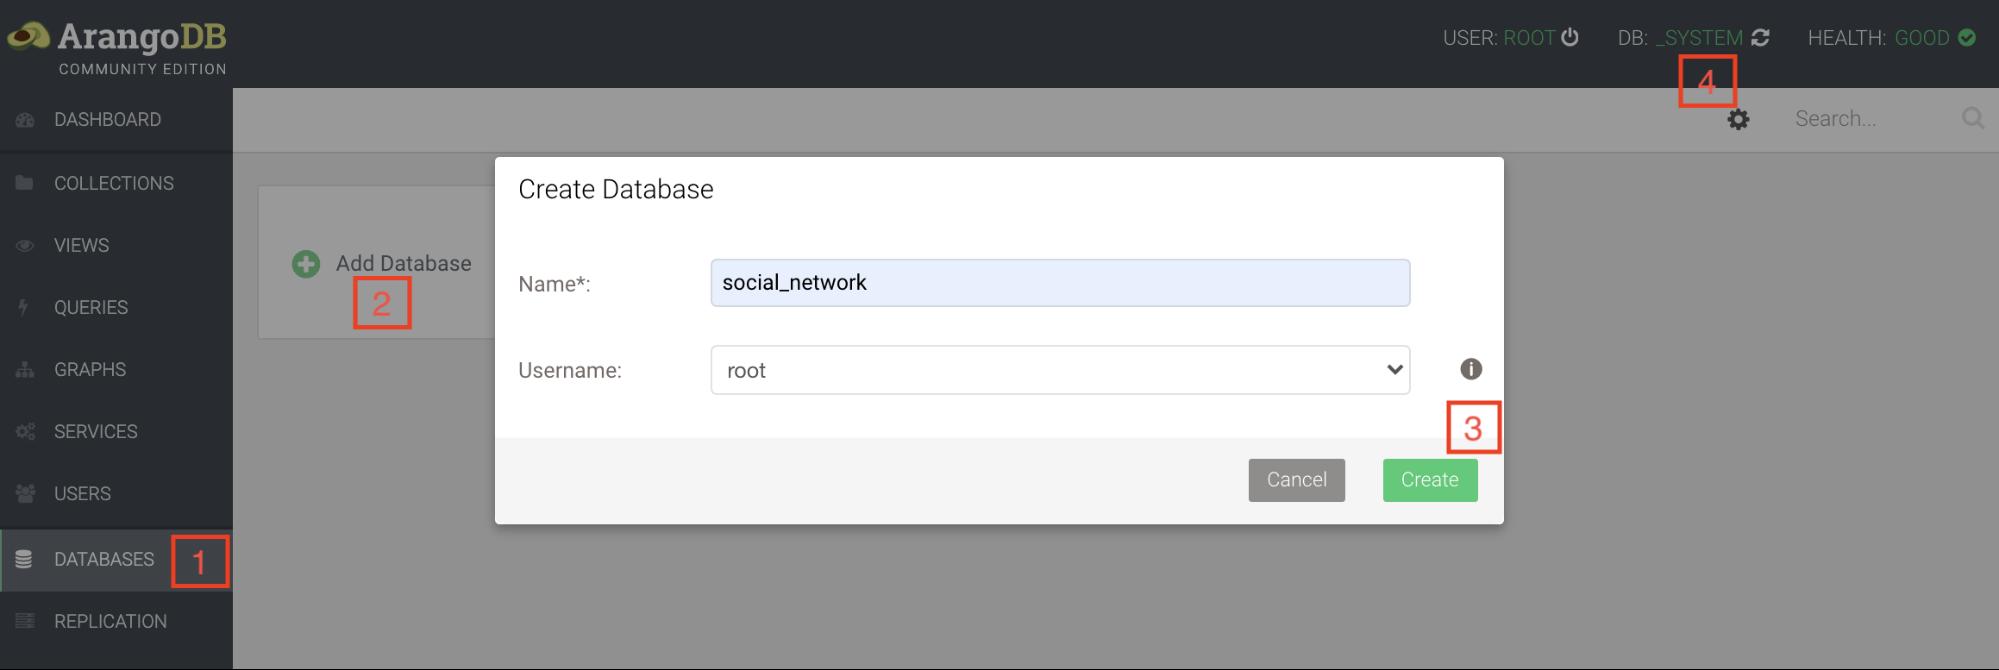 03_create_database